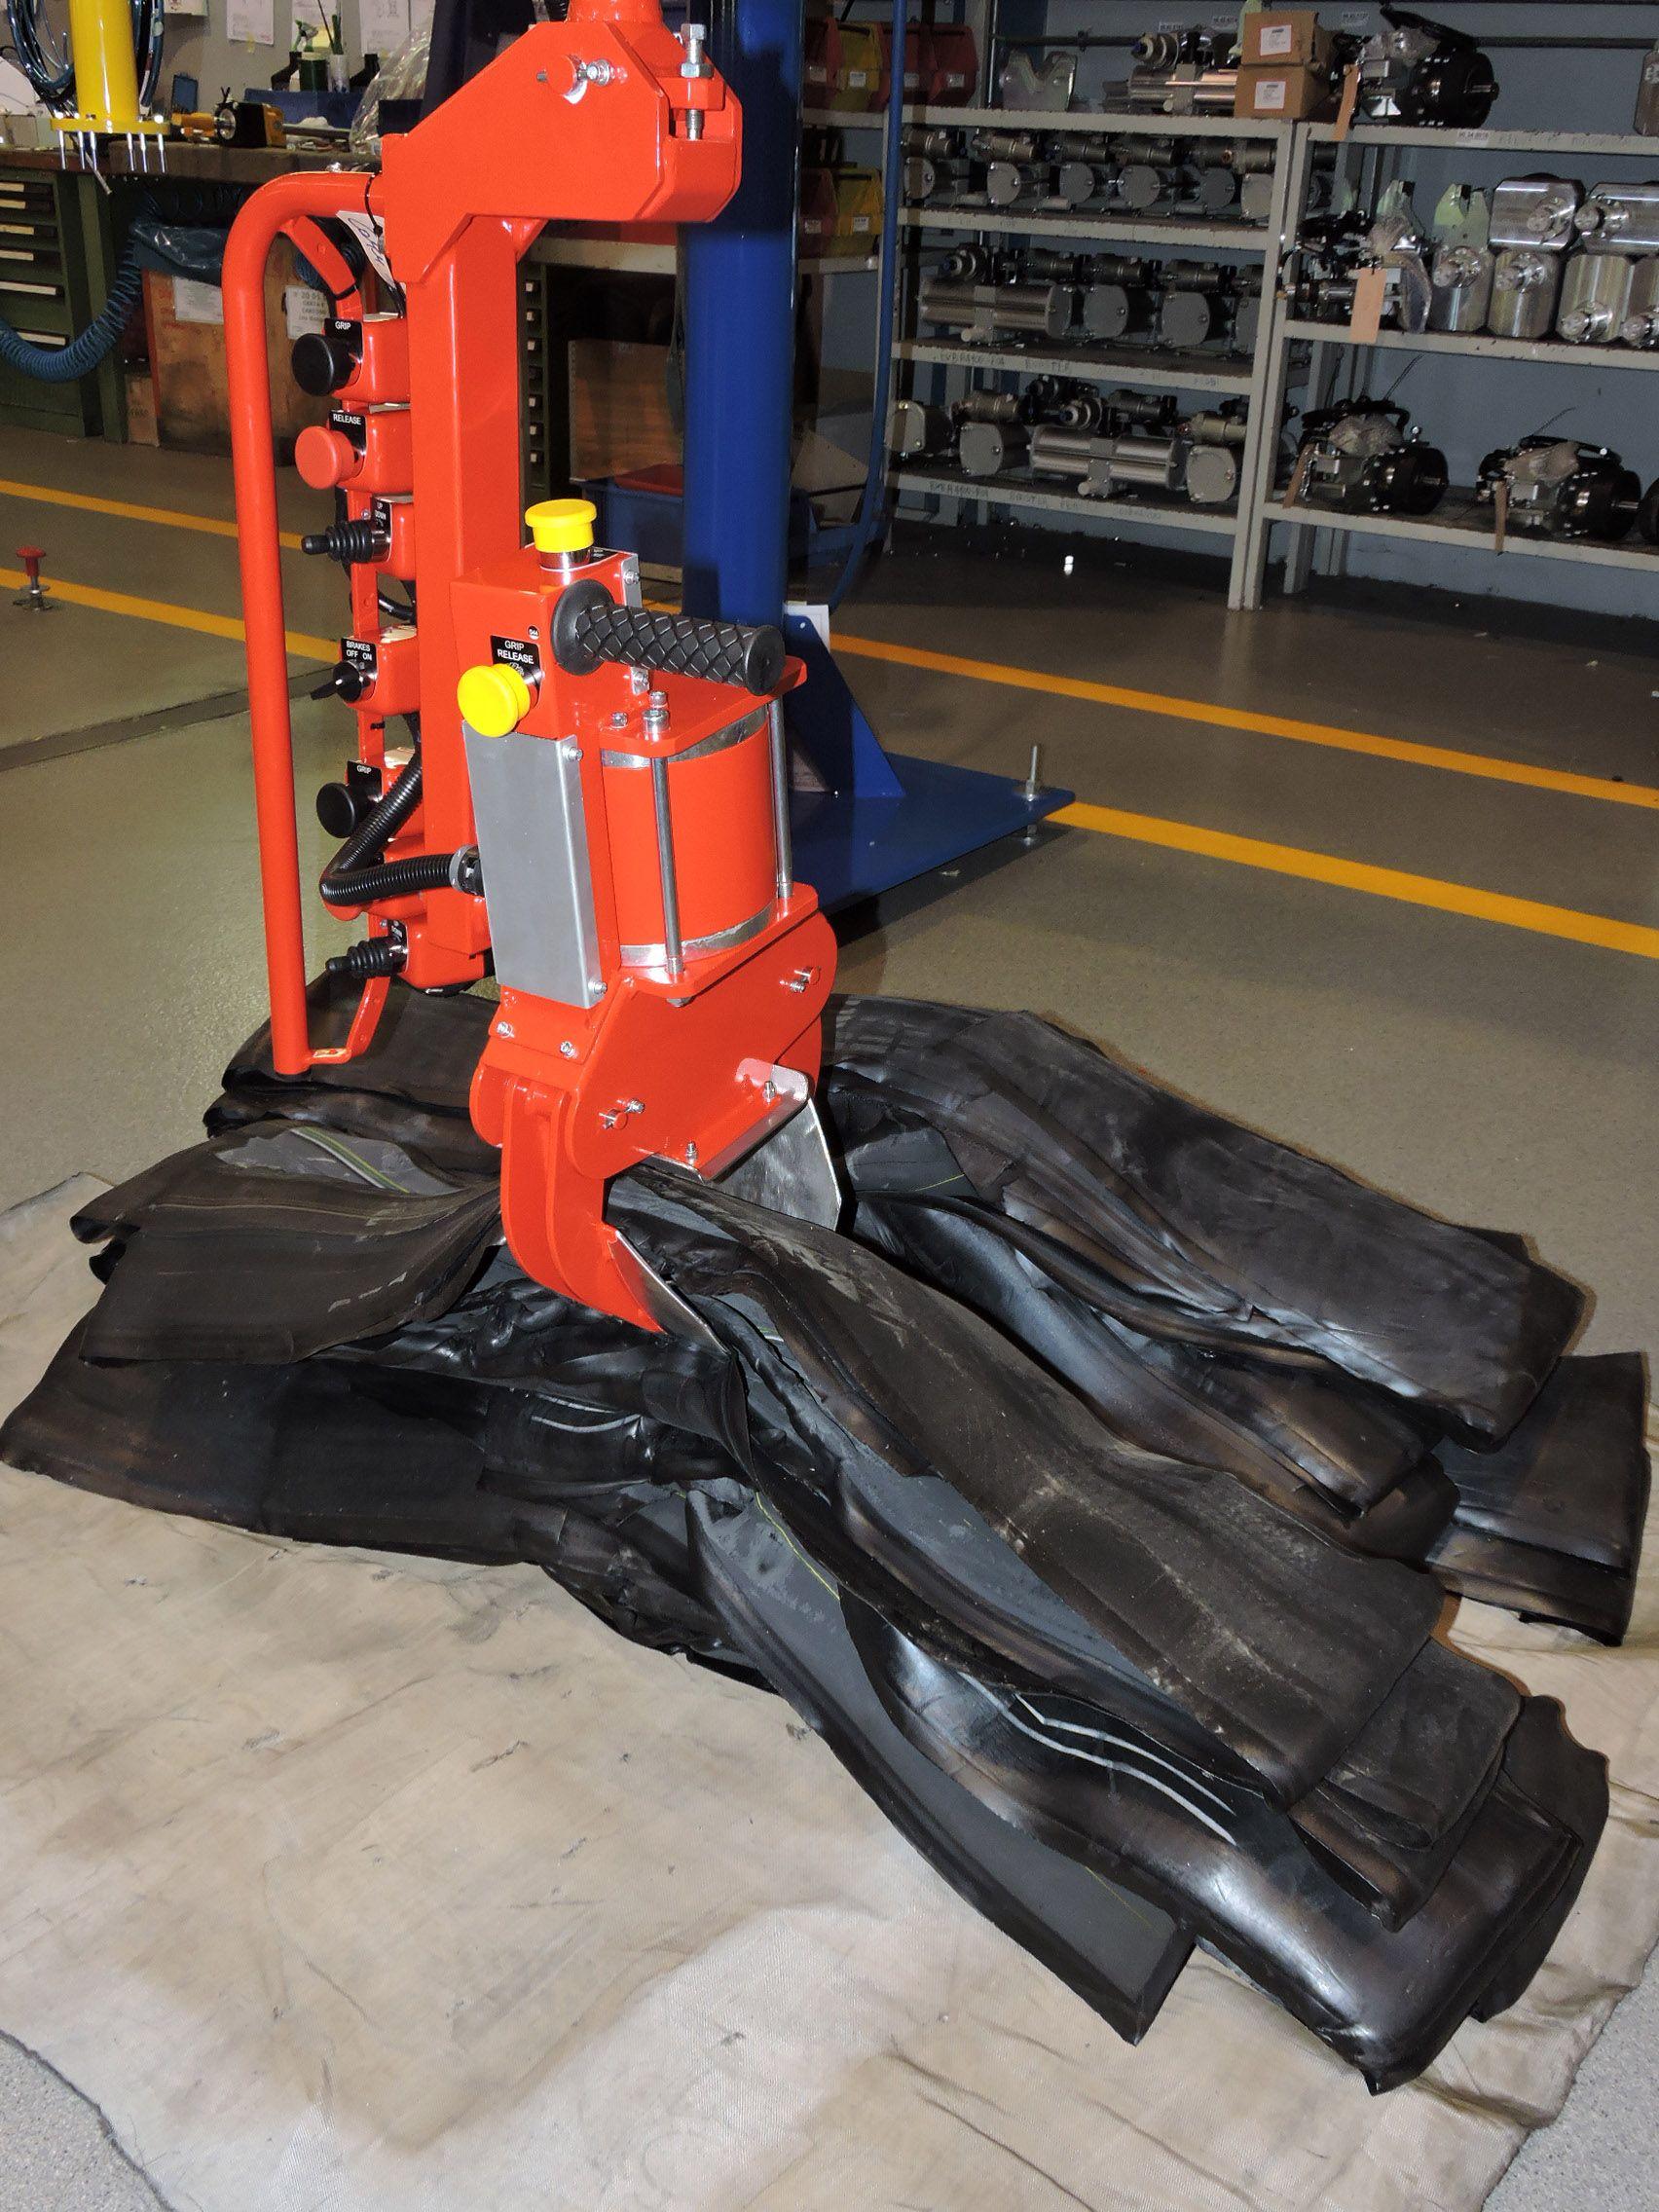 Pneumatic Manipulator Arms : Pneumatic arms for rubber manipulator